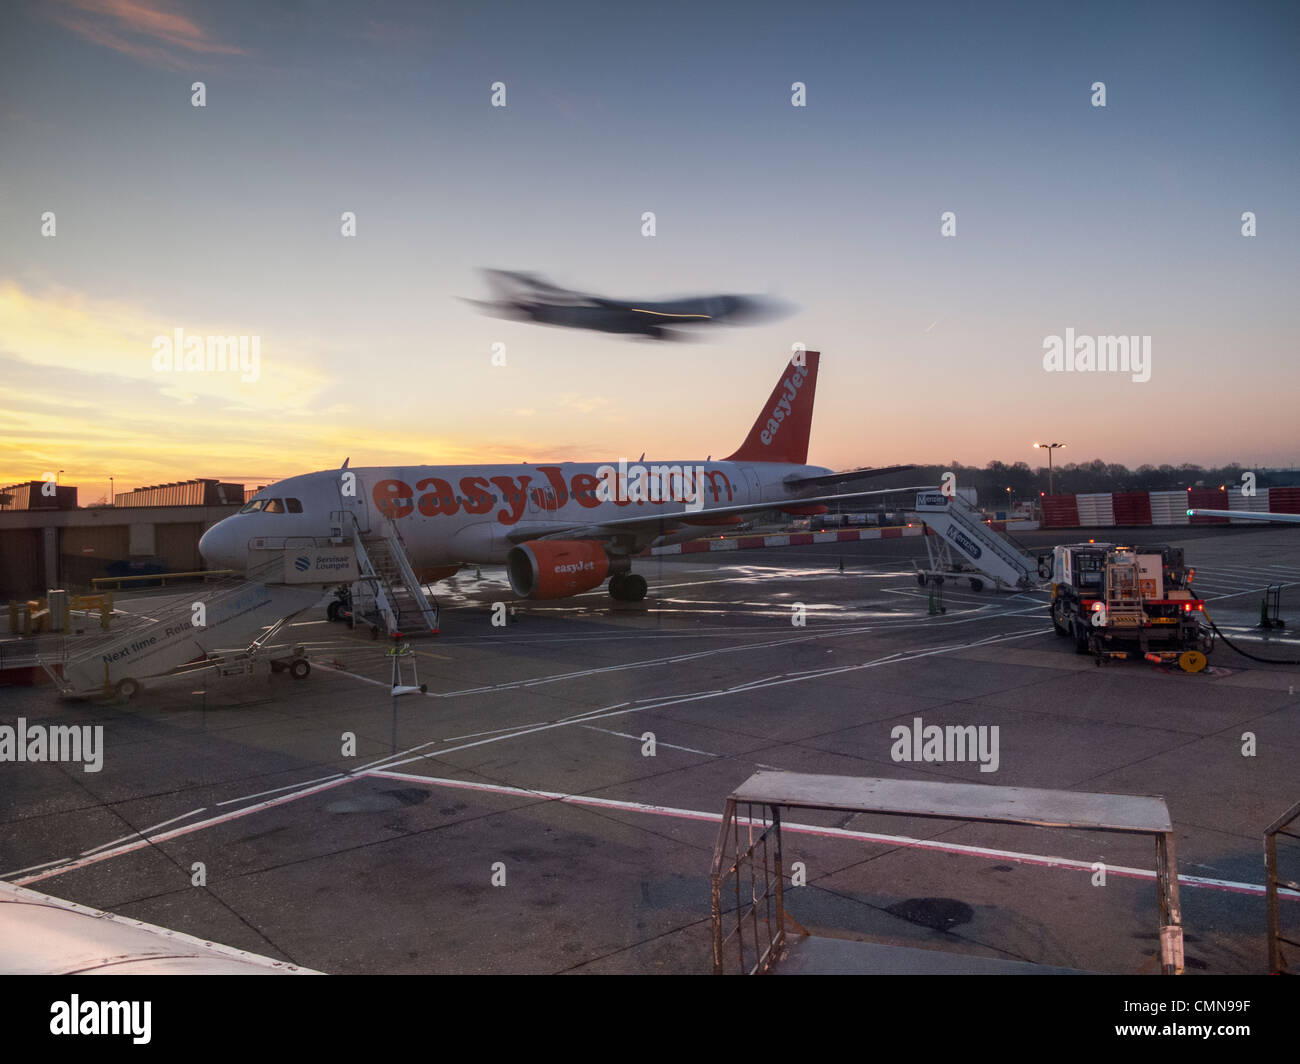 Easyjet aircraft,Gatwick Airport,London,England - Stock Image